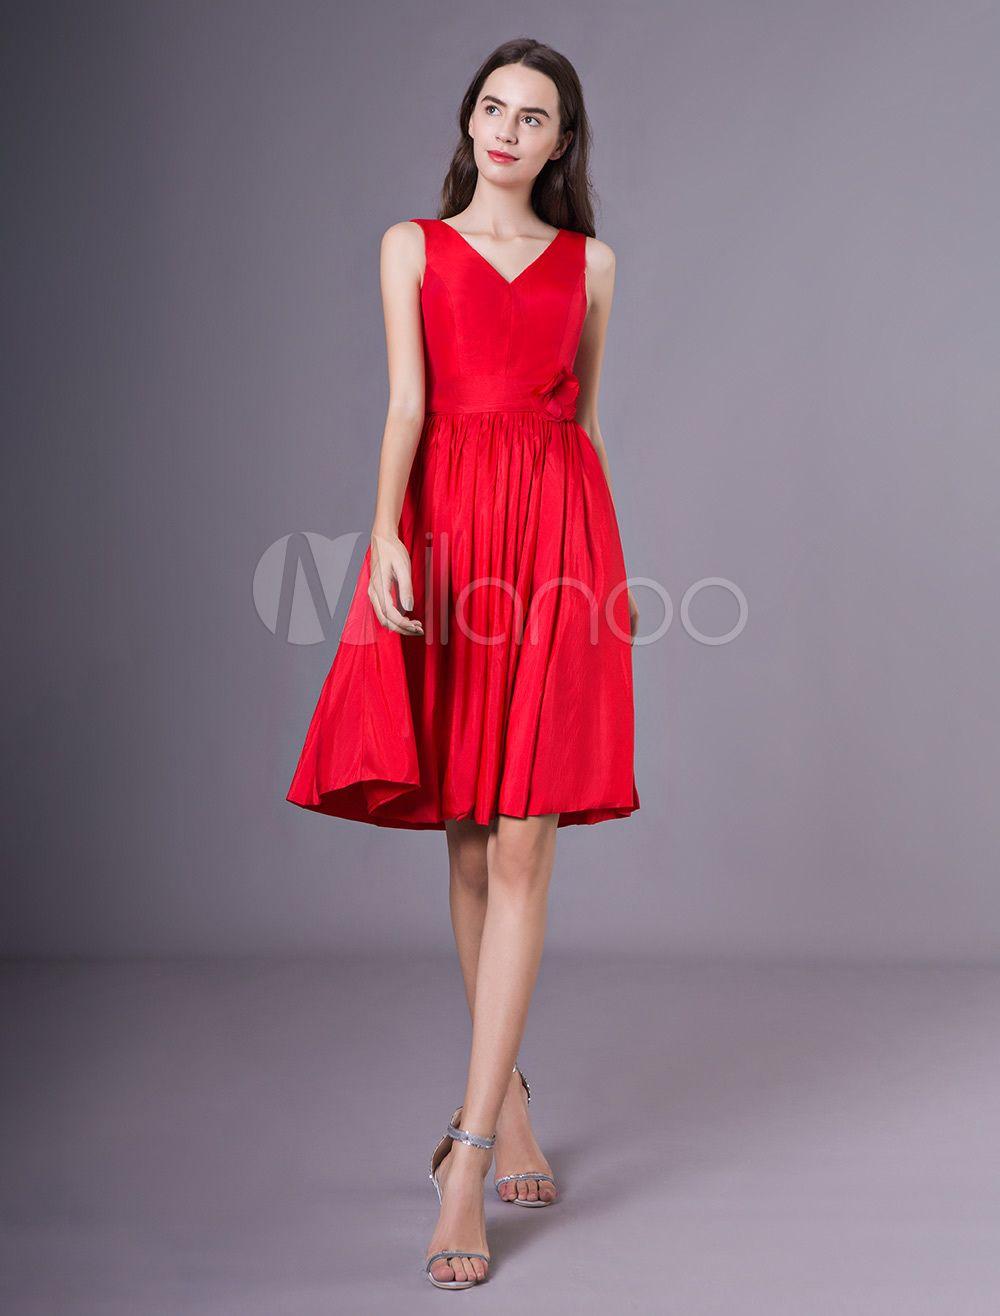 119997c38ba9 Cocktail Party Dresses Red V Neck Taffeta Flower Wedding Guest Dress ...